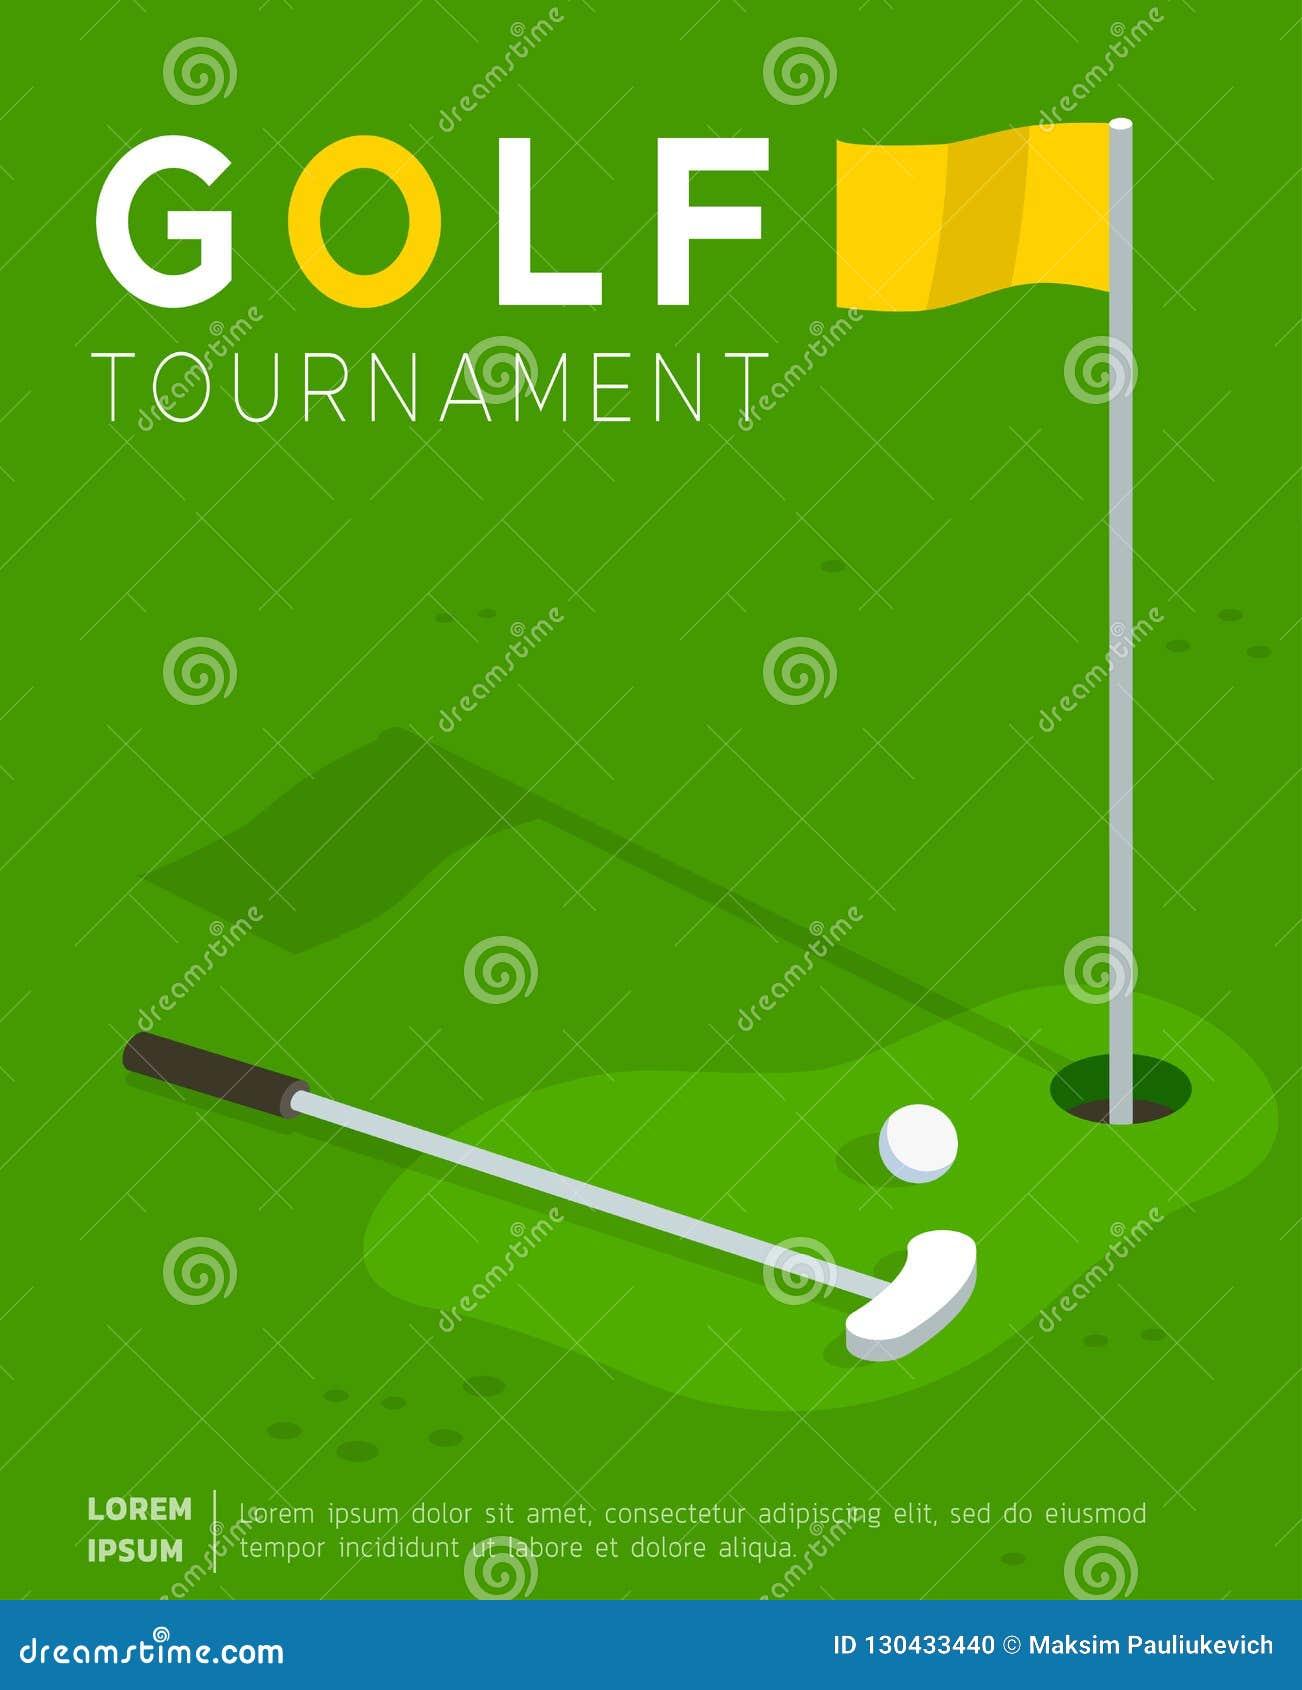 Golf tournament promo poster flat vector template